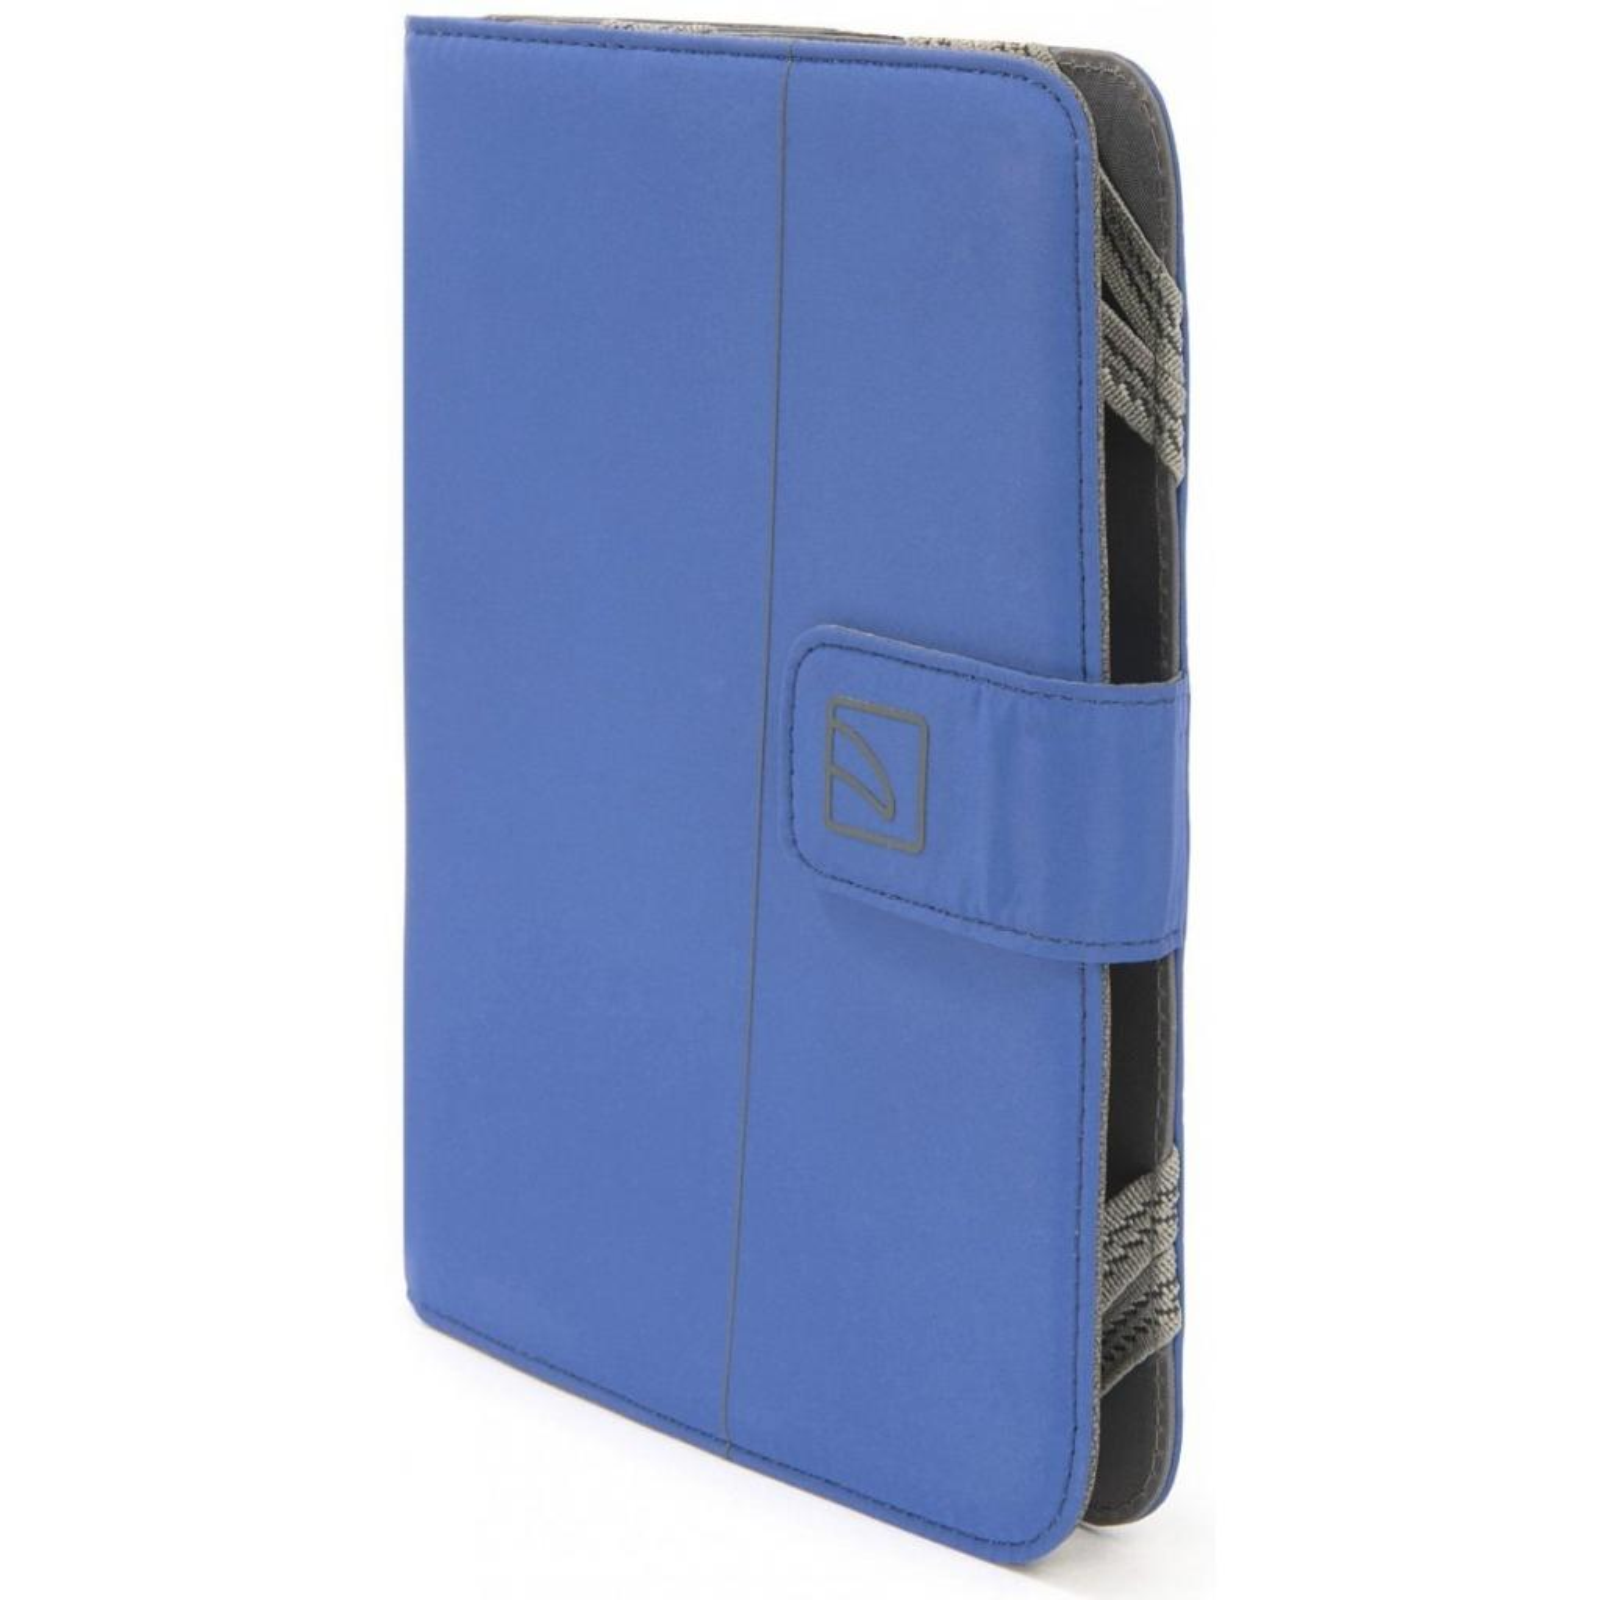 "Чехол для планшета Tucano 7"" Facile Stand Blue (TAB-FA7-B) изображение 2"